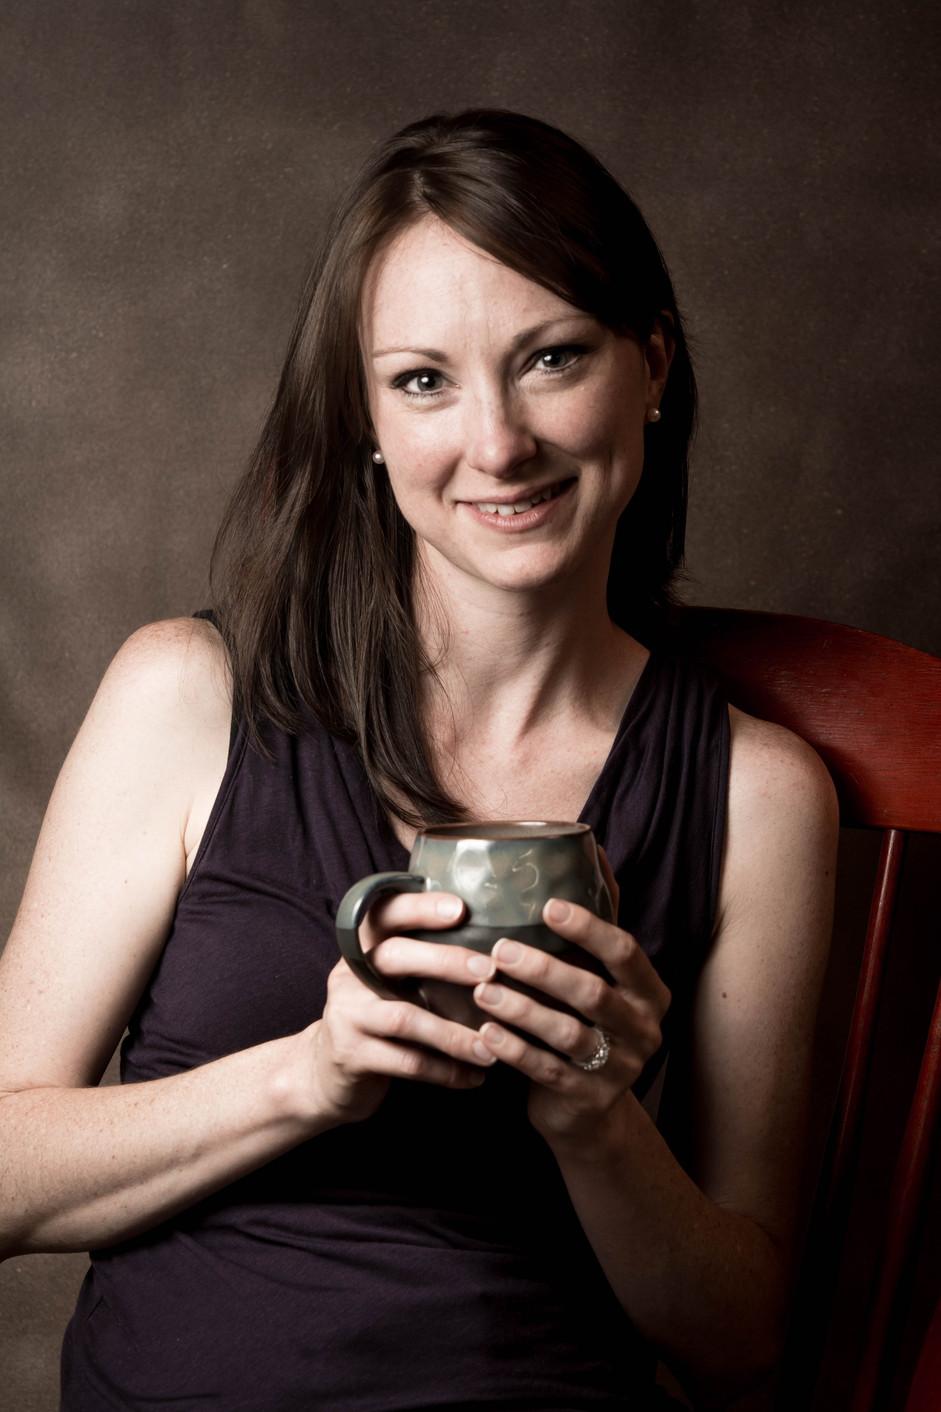 woman coffee portrait photography